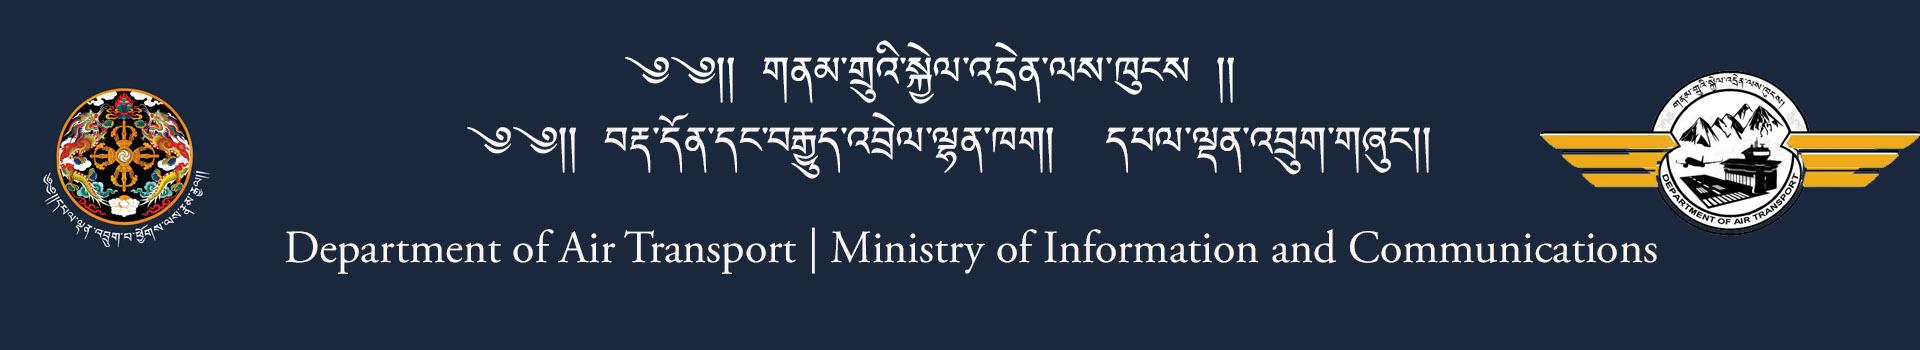 Department of Air Transport